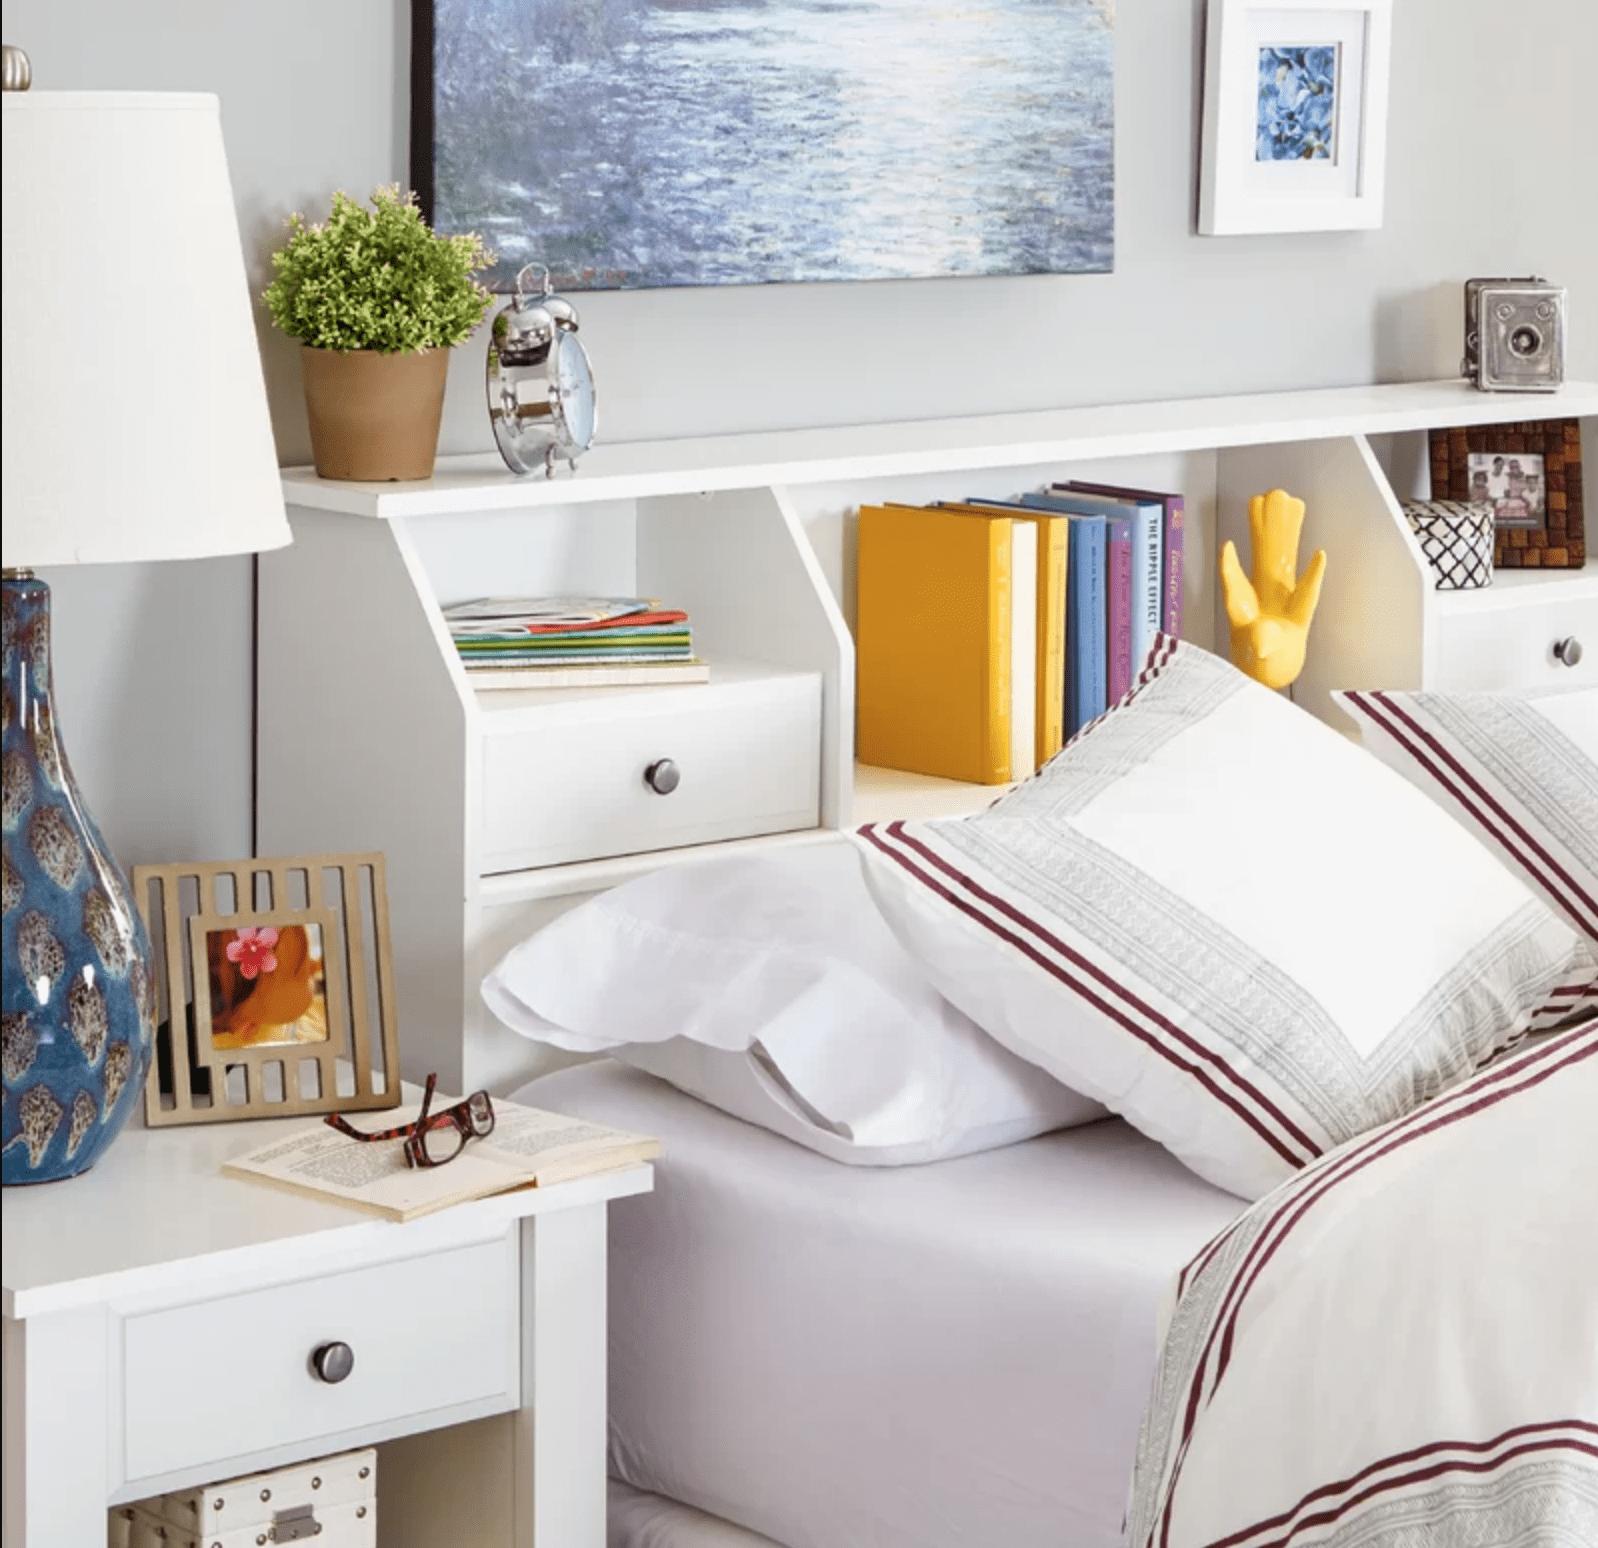 Lax Series Platform Bed bookcase headboard storage ideasbudget | apartment therapy